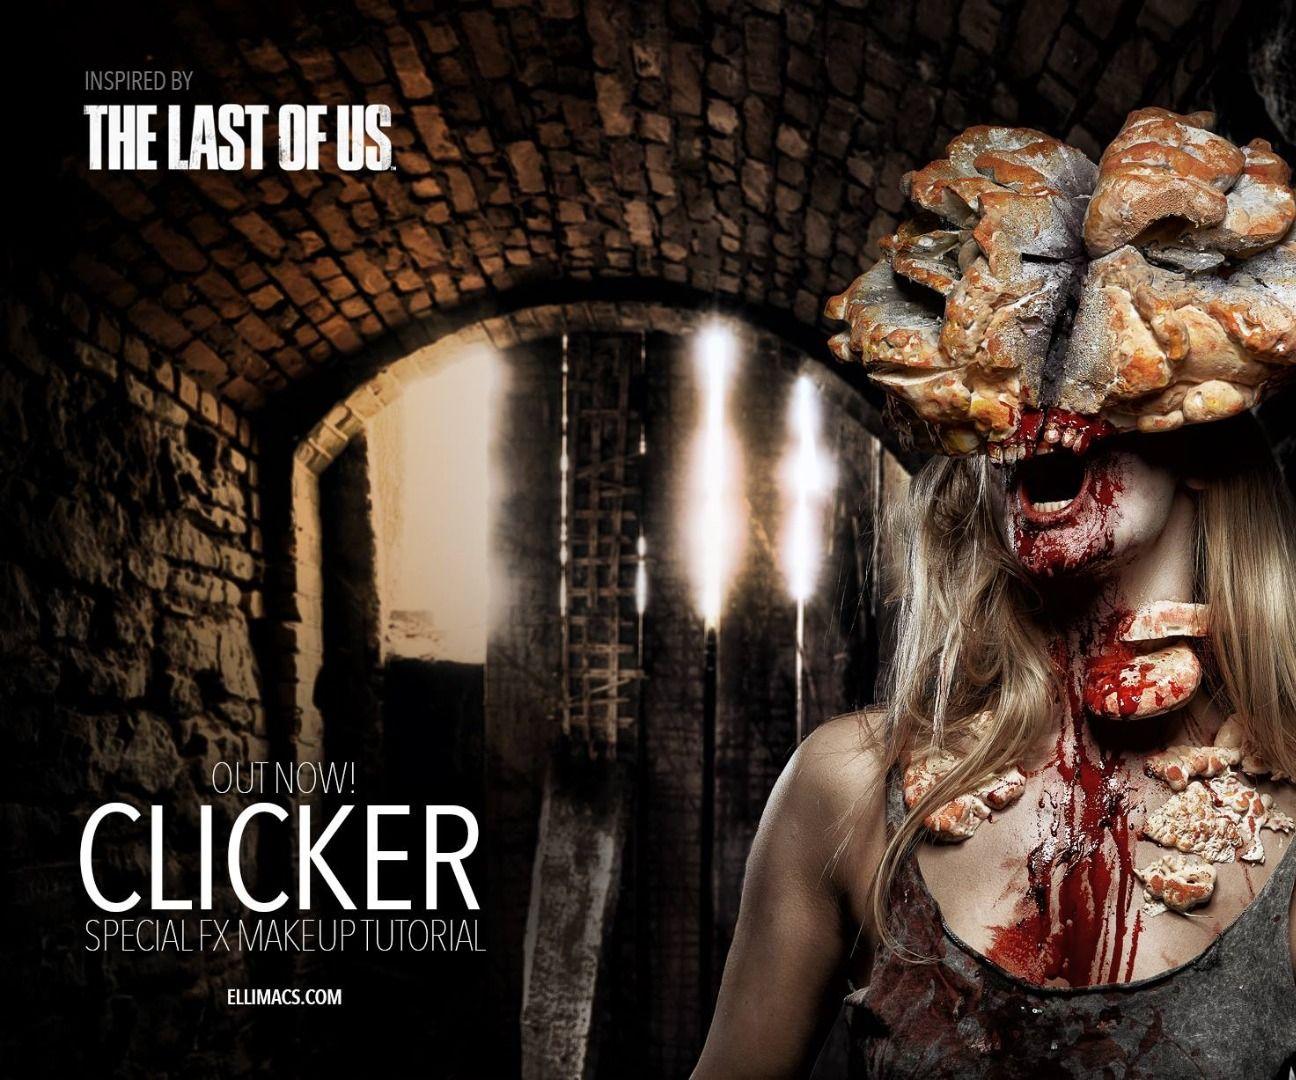 Last of Us Clicker - SFX Makeup Tutorial